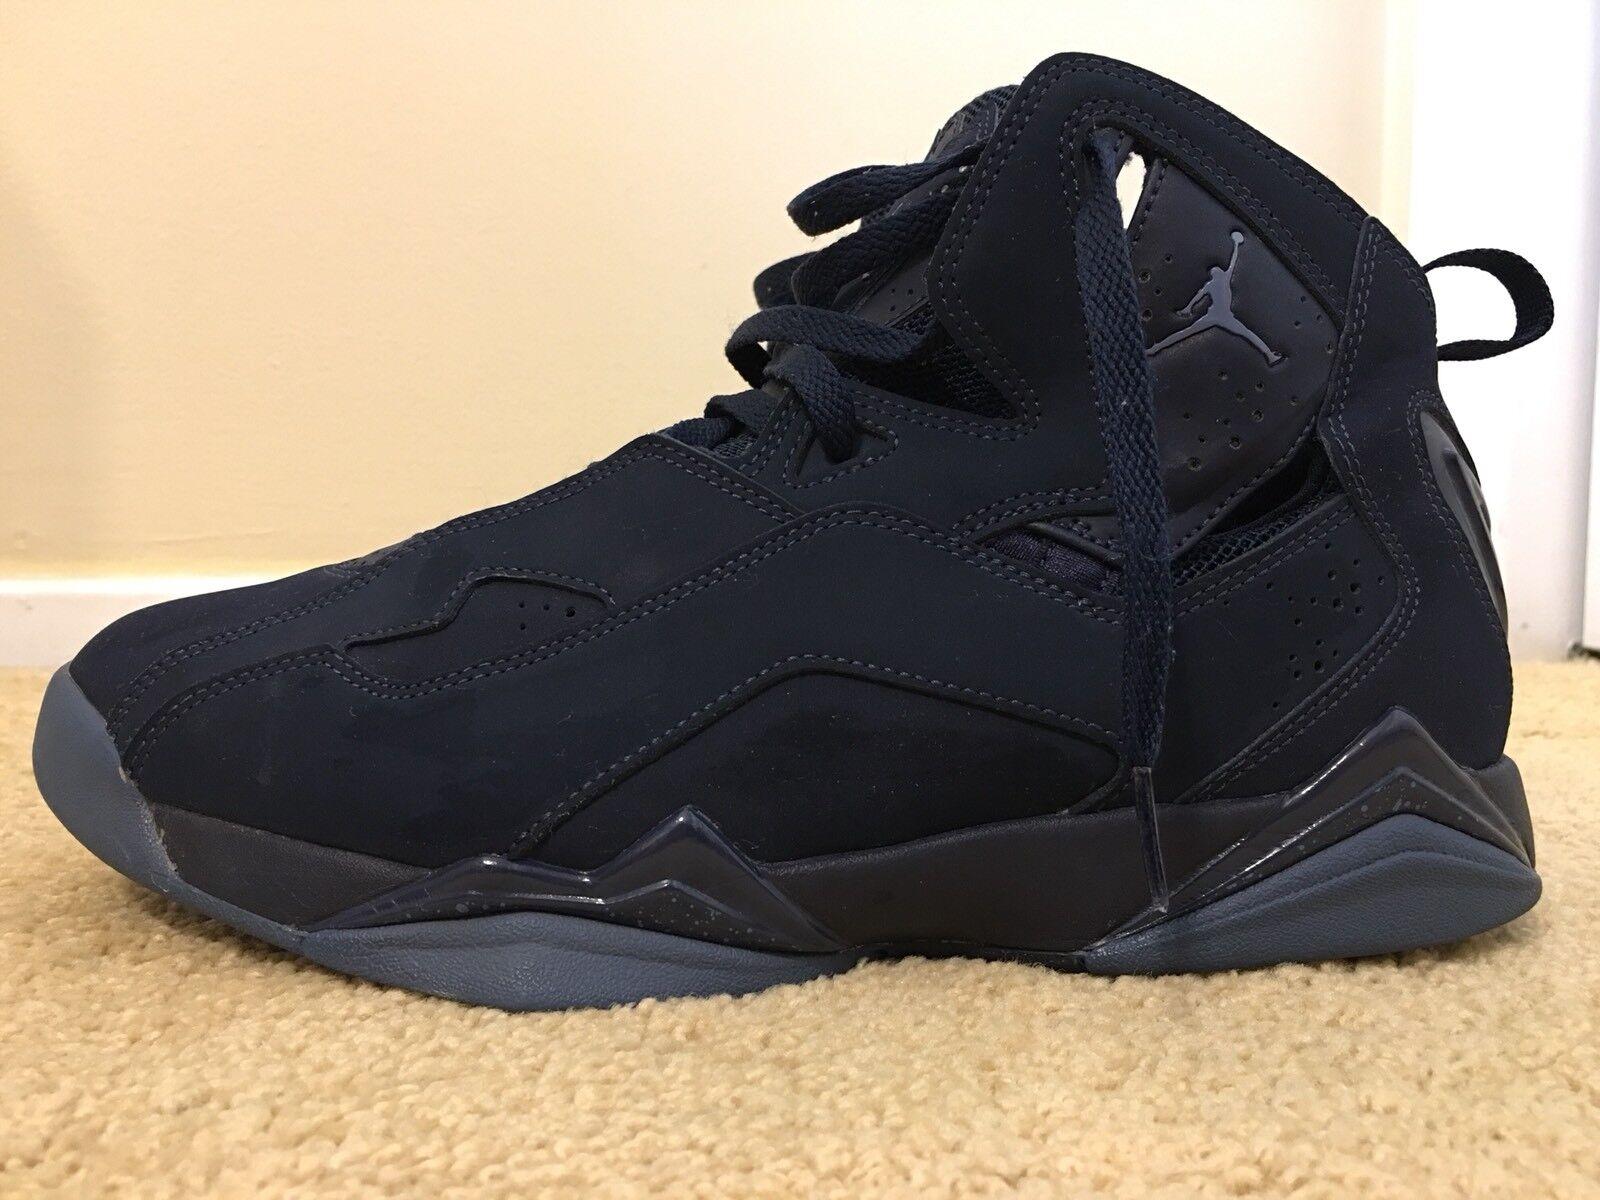 a3ee0091b784 ... spain nike jordan true mens flight 342964 405 obsidian mens true  basketball shoes size 10.5 fb4cfc